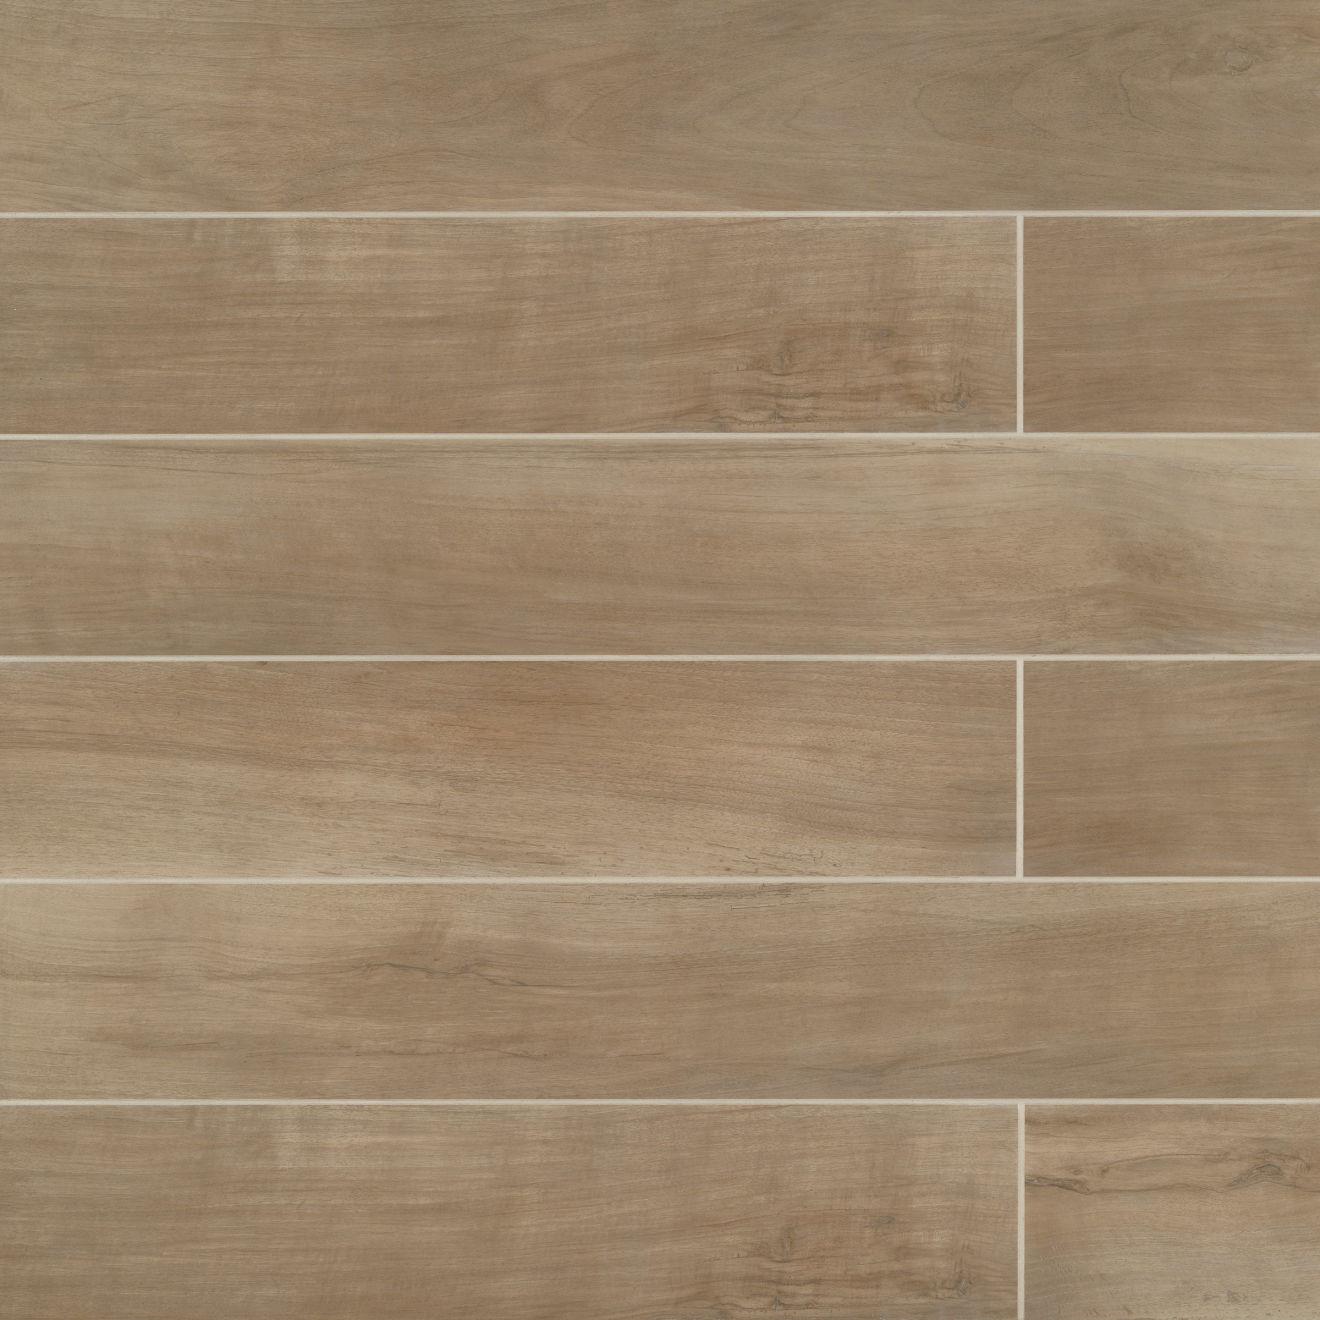 "Antique 8"" x 48"" Floor & Wall Tile in Clay"